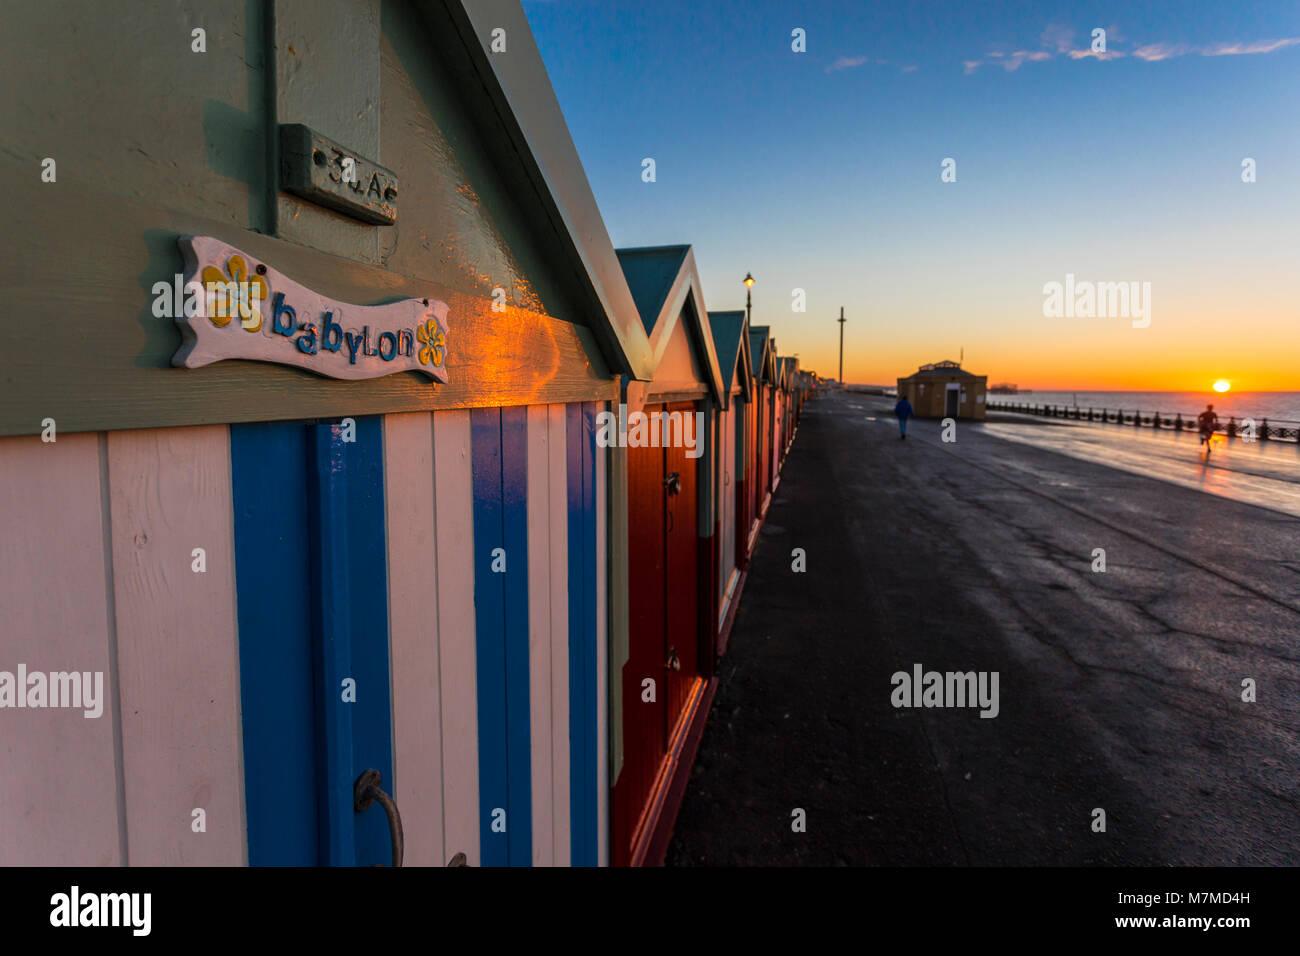 Brighton colorful beach hut beach house along the coast of Brighton Pier. - Stock Image